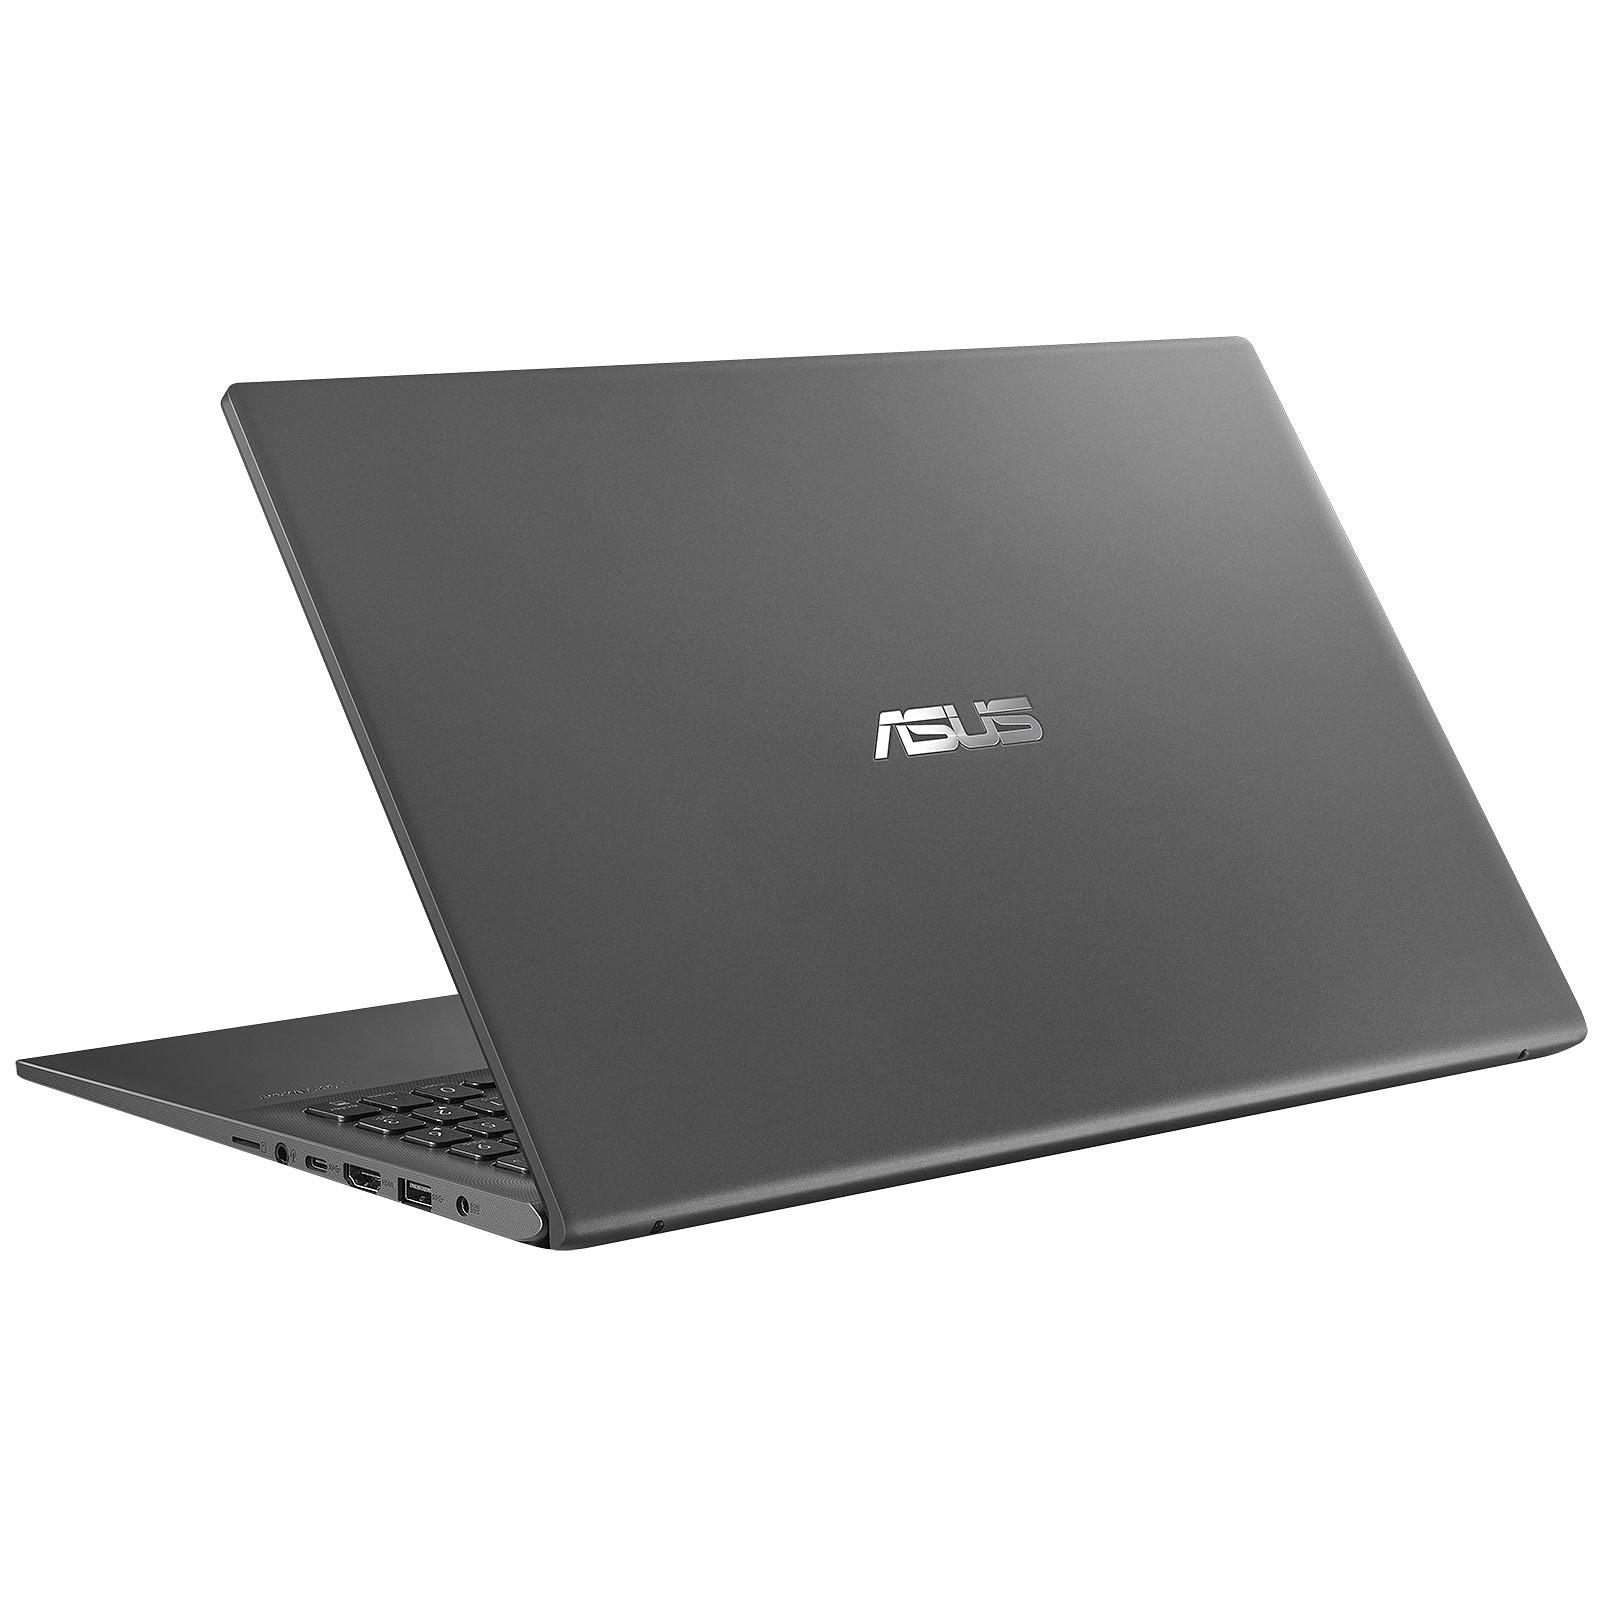 Asus ASUS P15 P1504FA-EJ709R (90NB0KR3-M10370) - Achat / Vente PC portable sur Cybertek.fr - 1